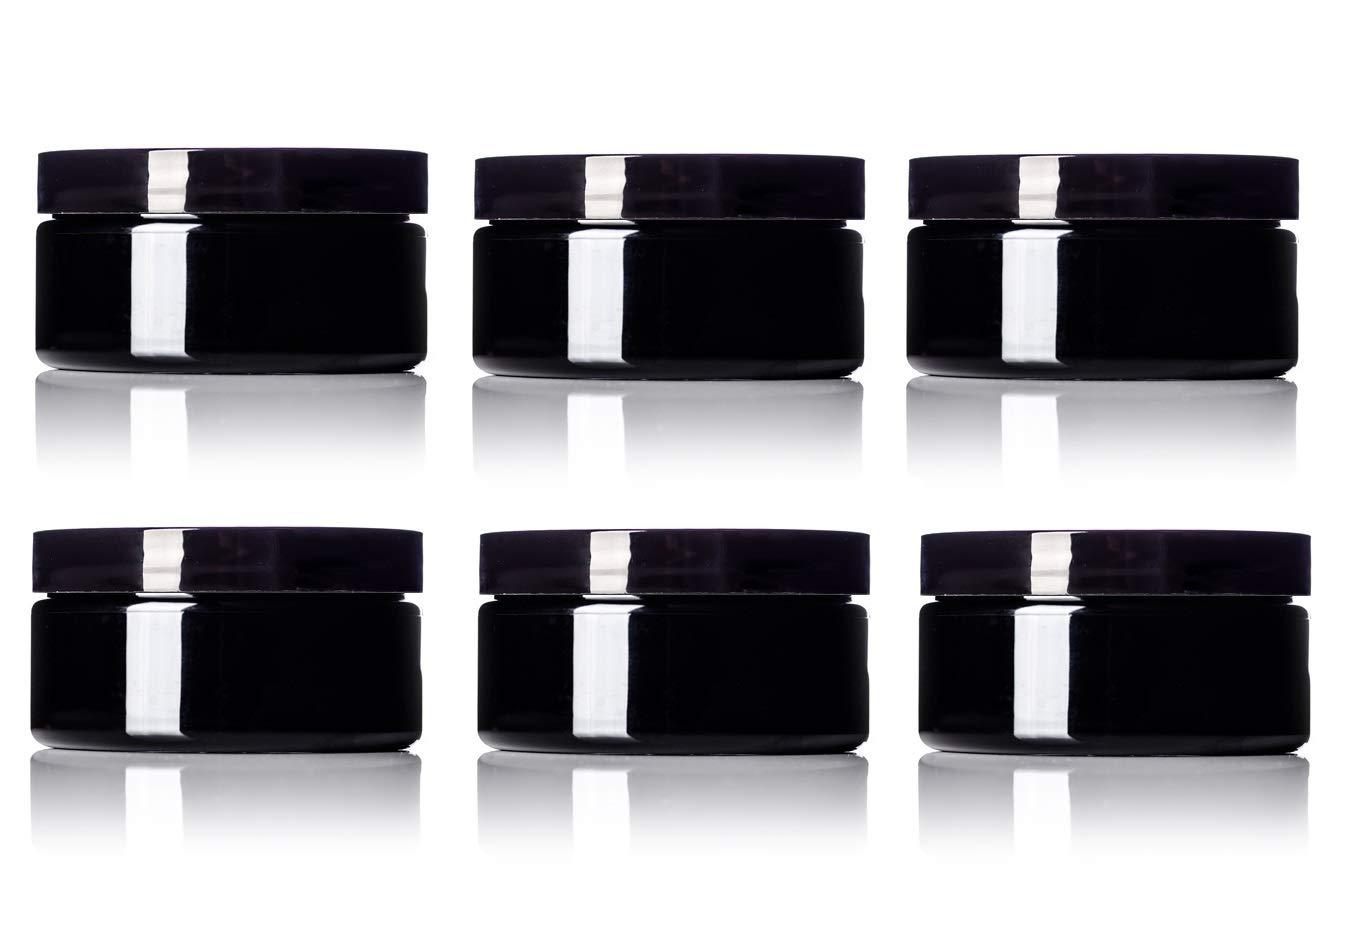 6 Pack – 8 oz Black PET Wide Mouth Single Wall Jar with Black Lids 89-400 neck